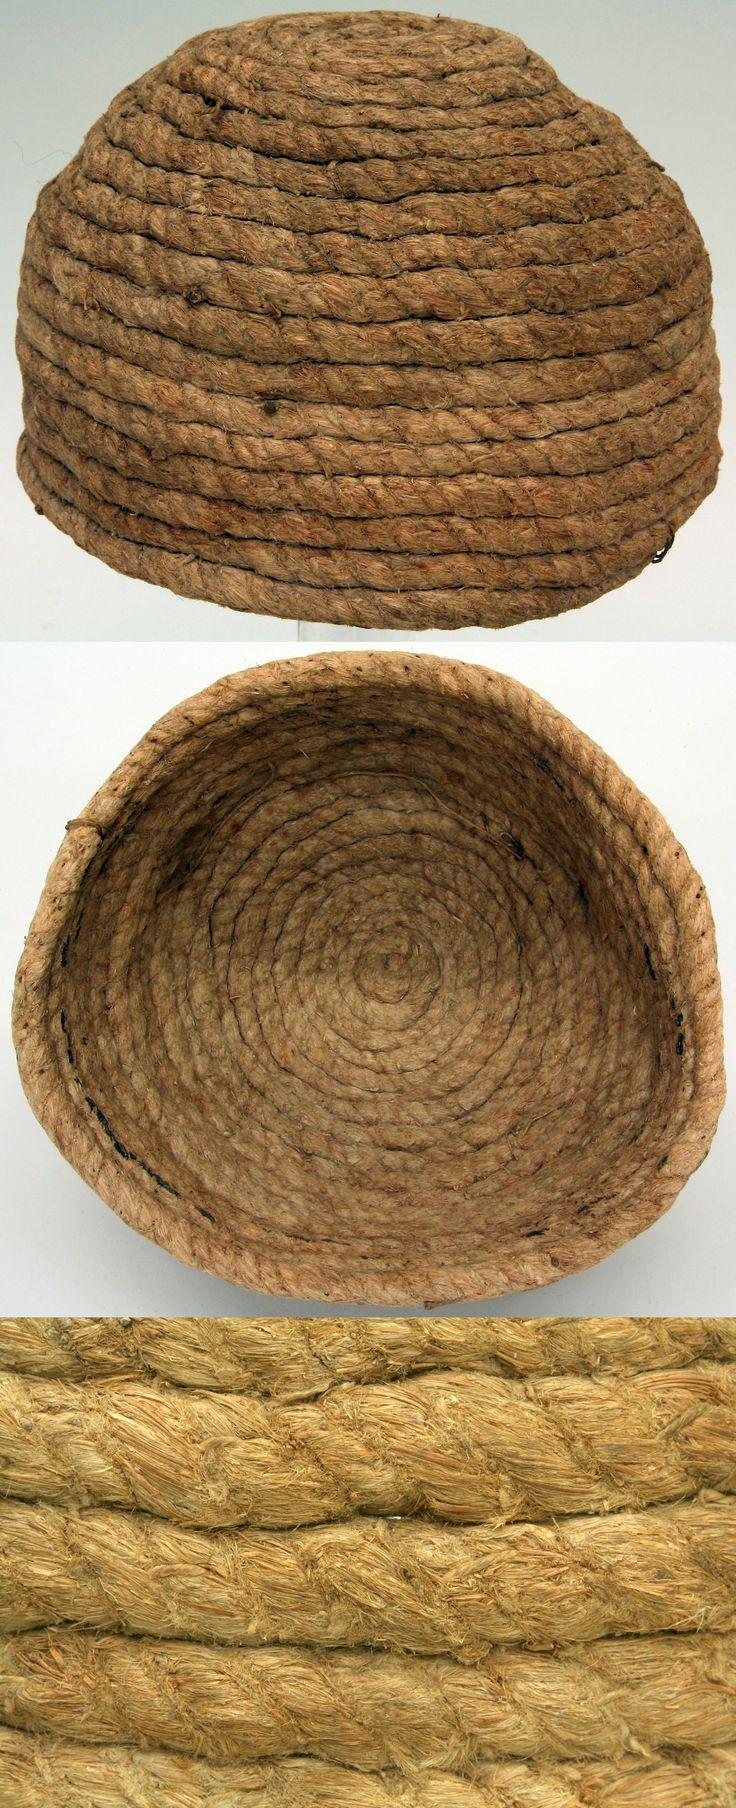 Cerveliere (cap worn under mail), 14th to 15th century, German, rope, Met Museum.